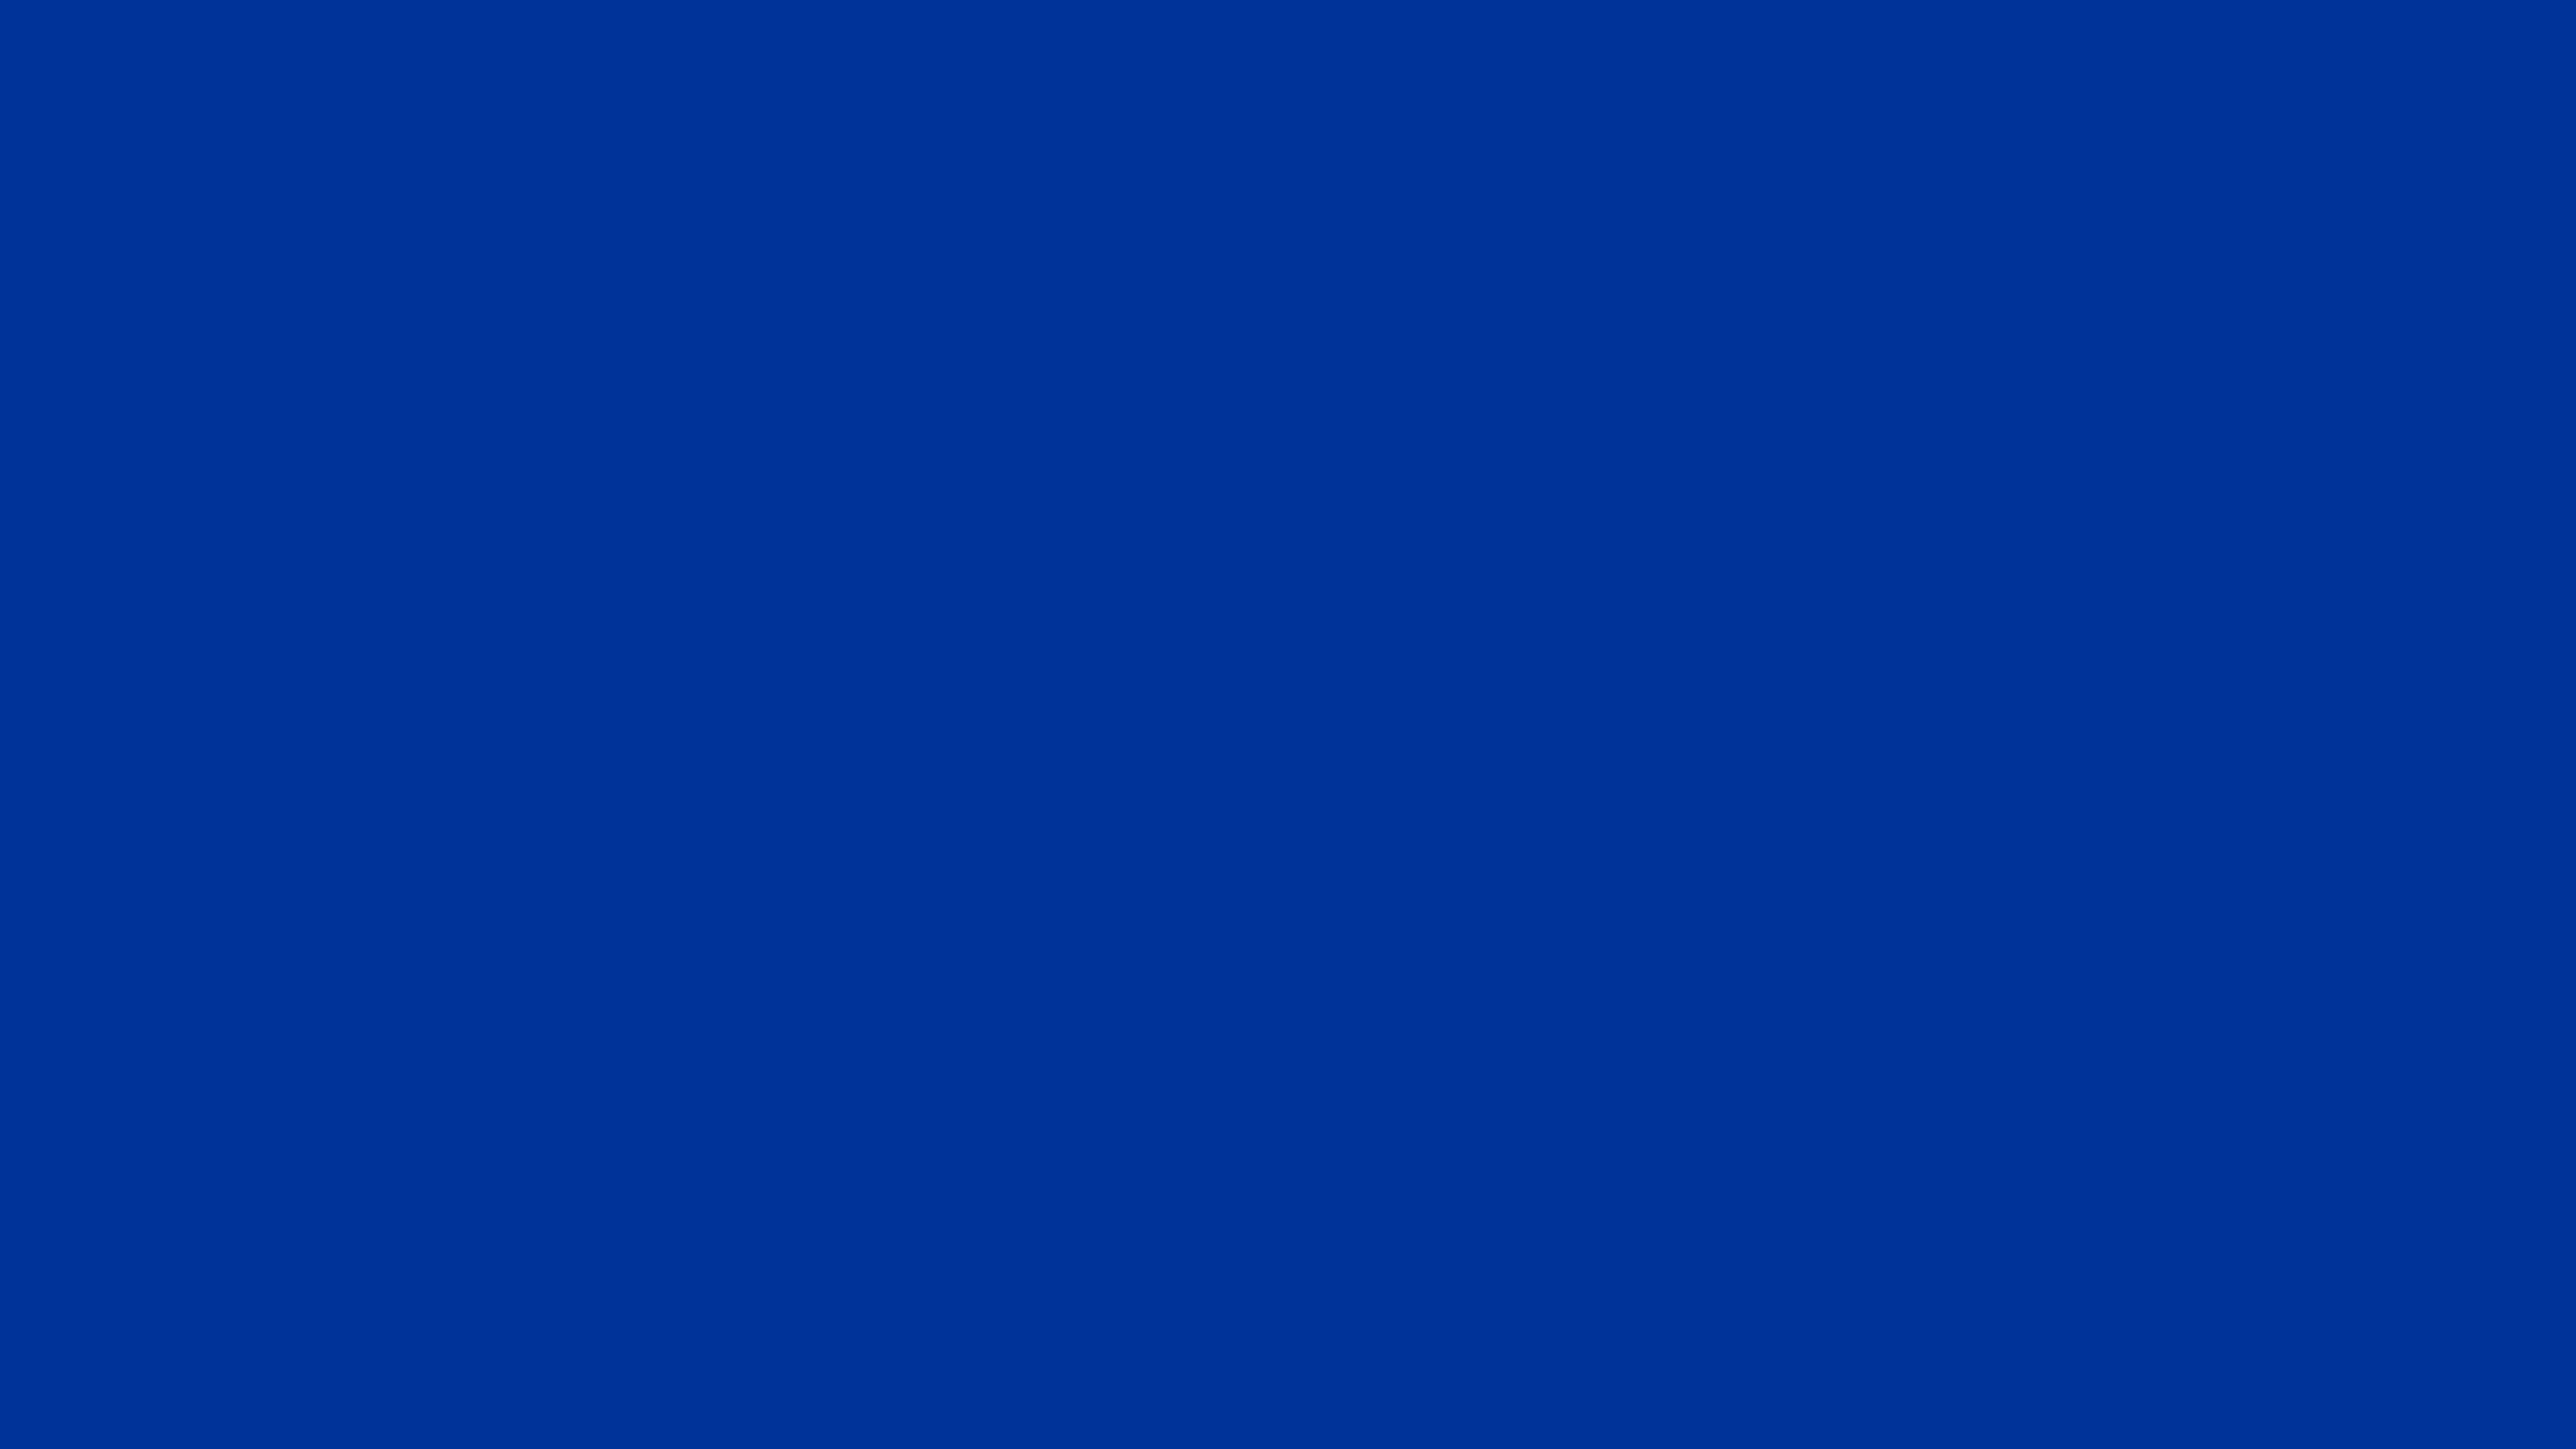 5120x2880 Dark Powder Blue Solid Color Background